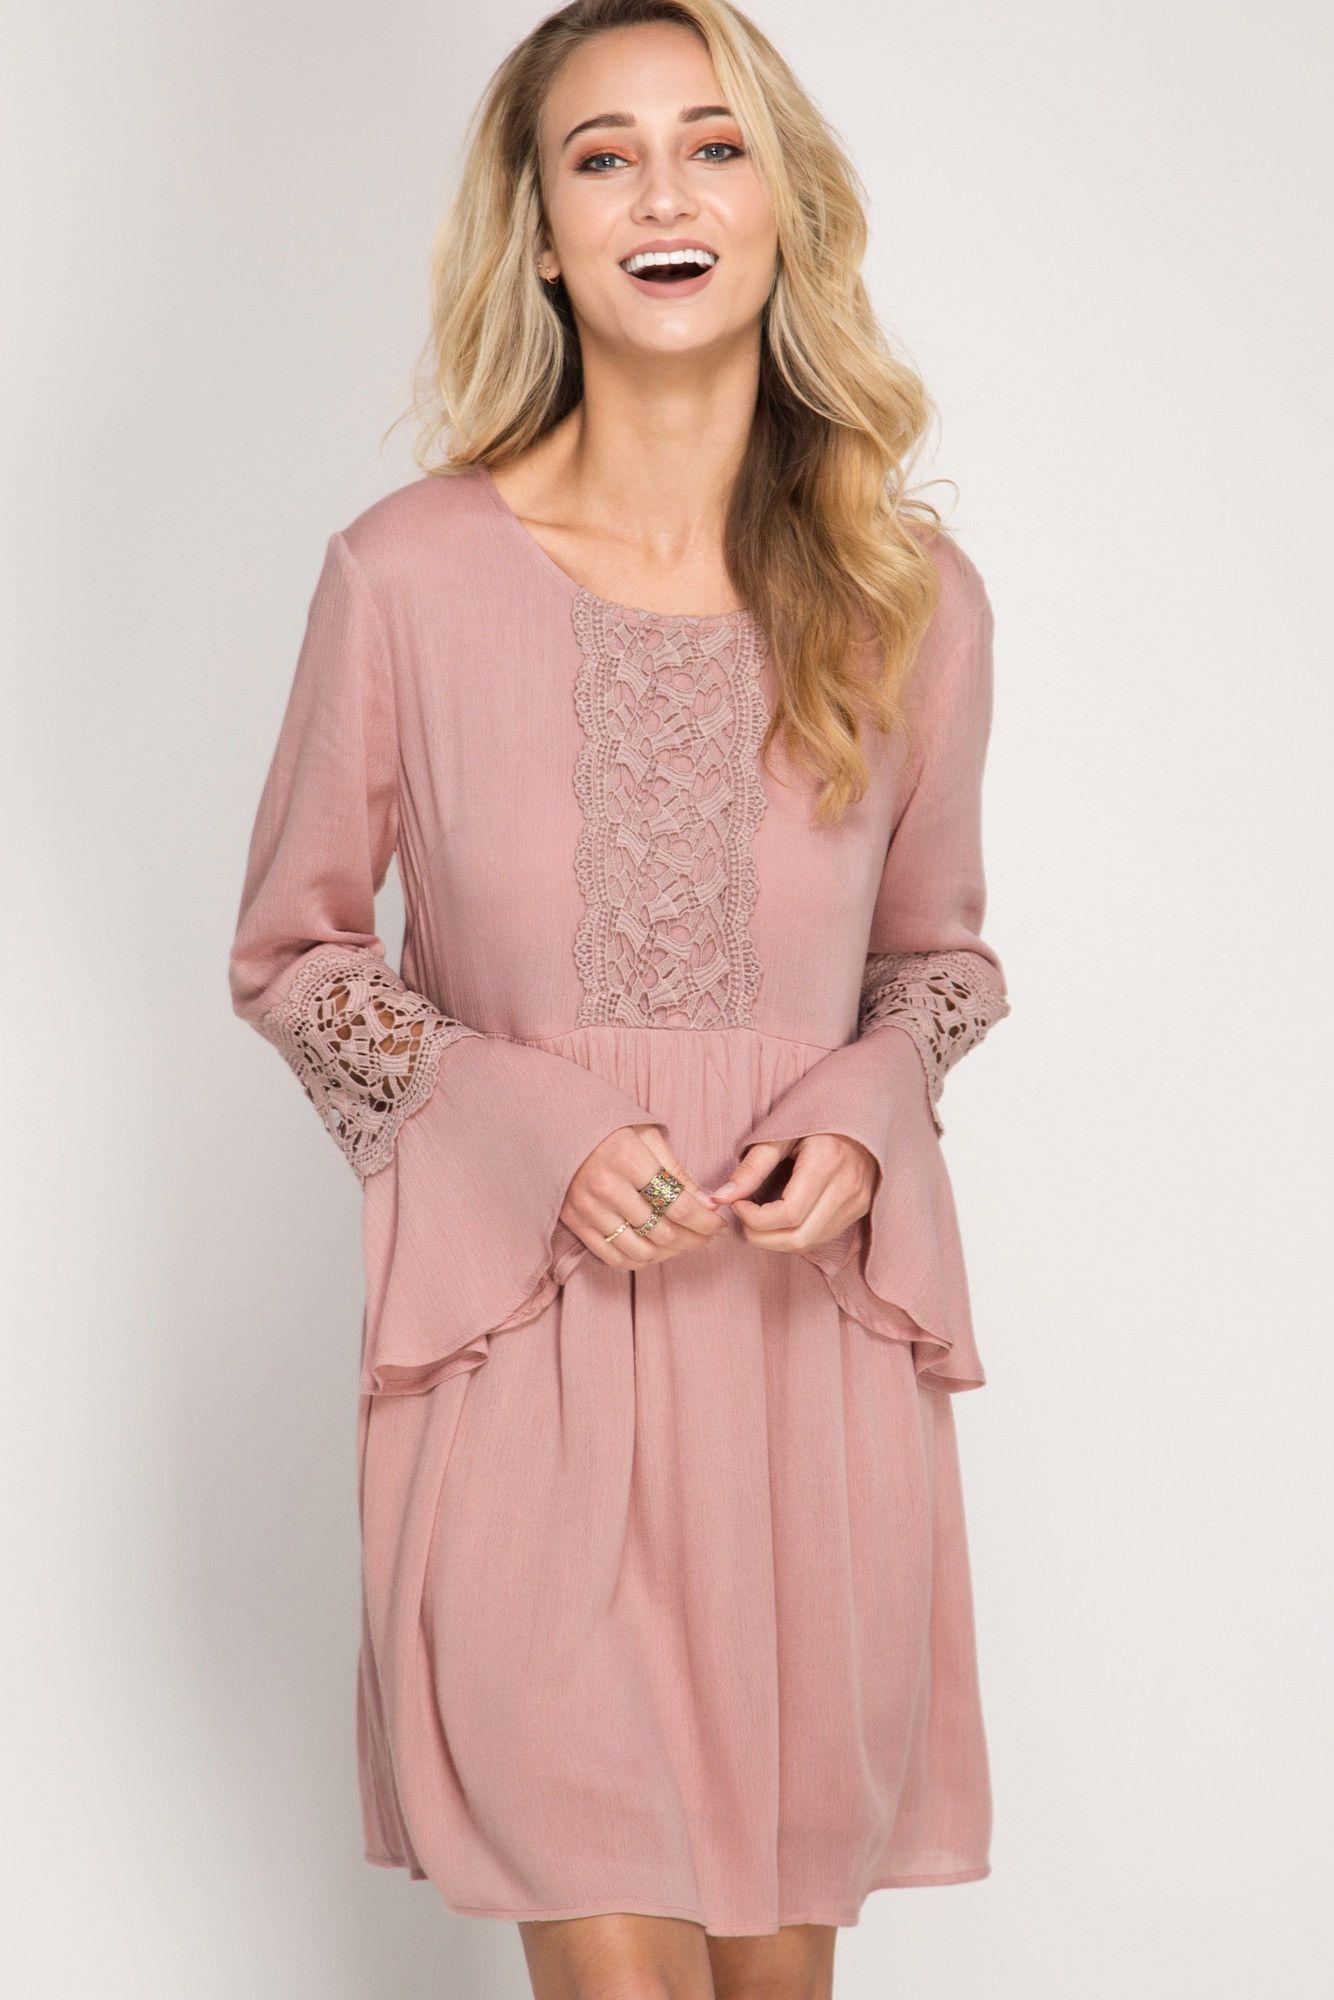 Dusty Rose | Pinterest | Vestidos de encaje, De encaje y Encaje